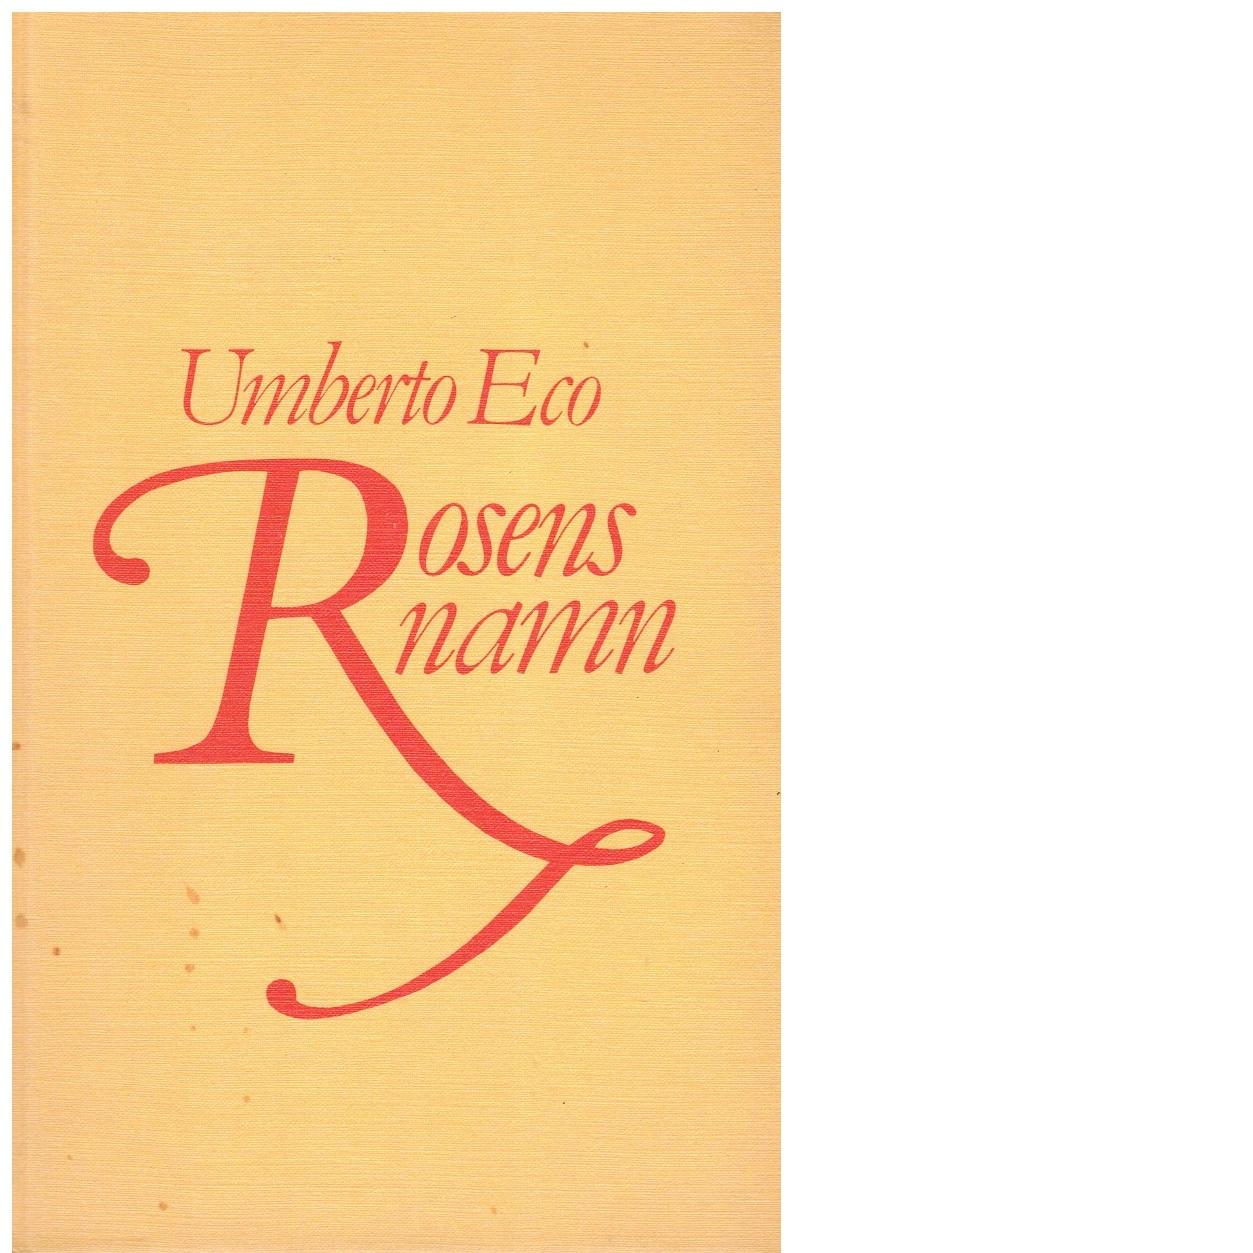 Rosens namn - Eco, Umberto